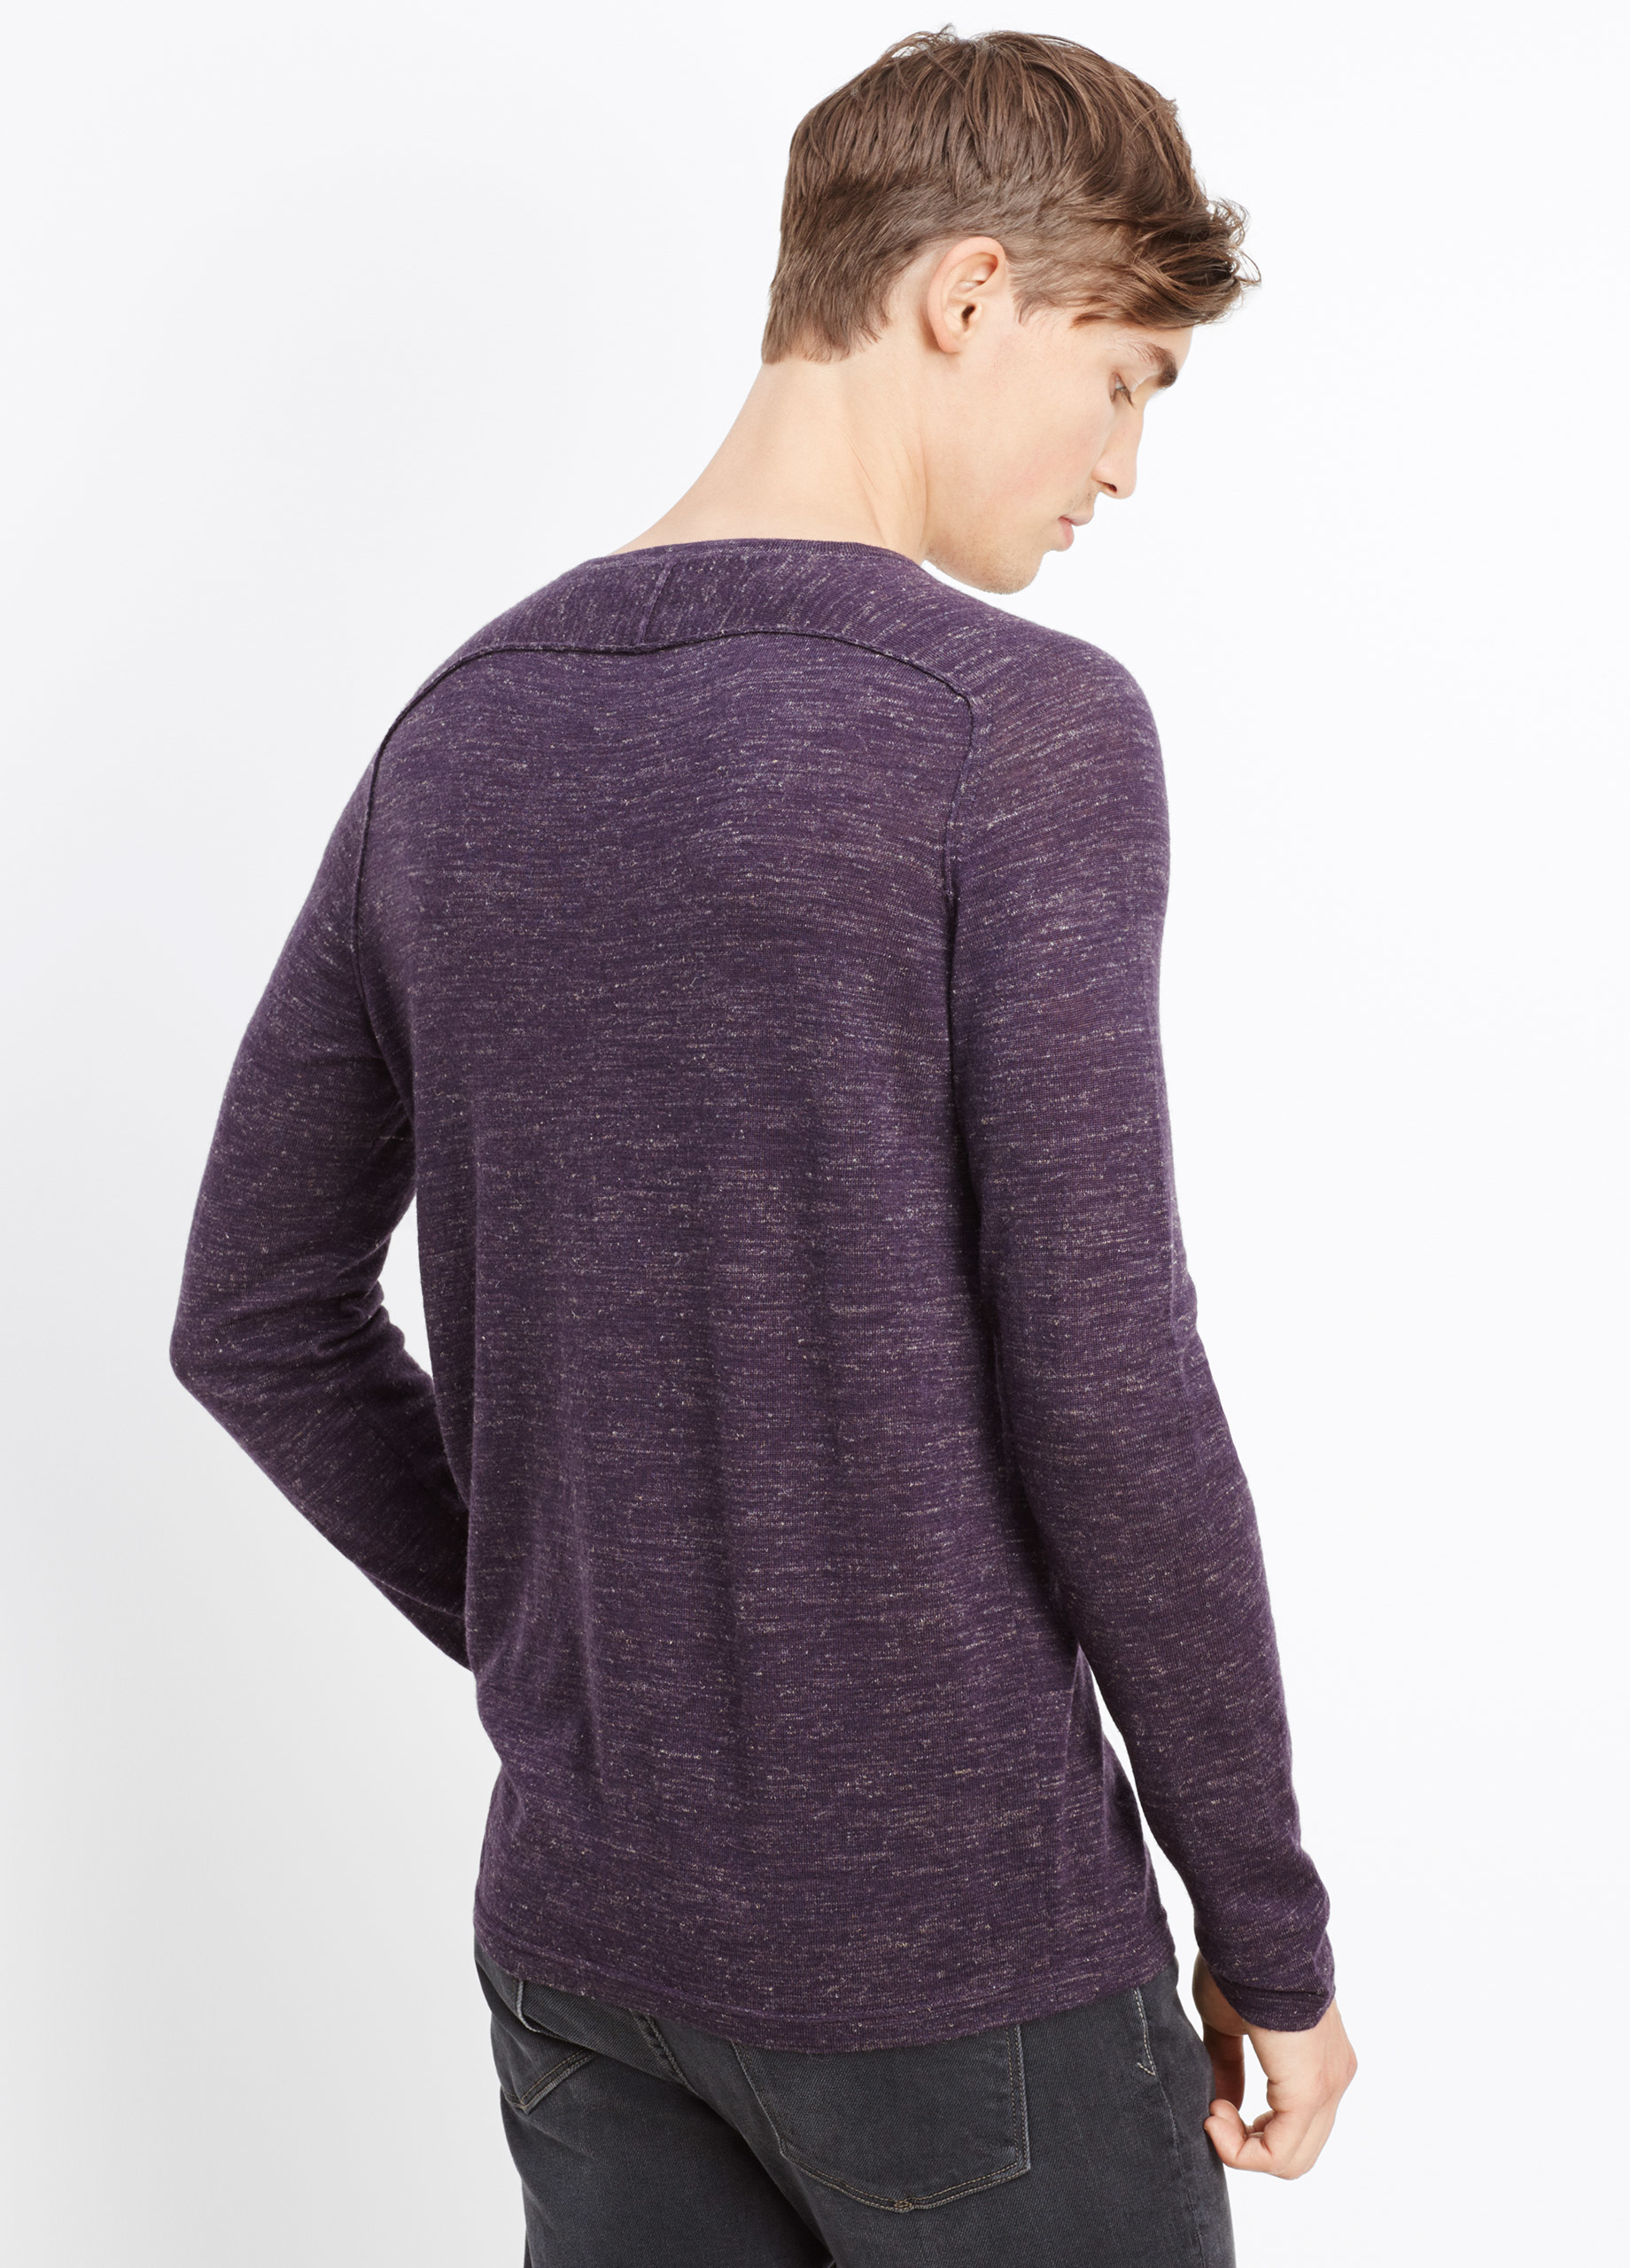 Vince Wool Linen Jasp 233 V Neck Sweater In Purple For Men H